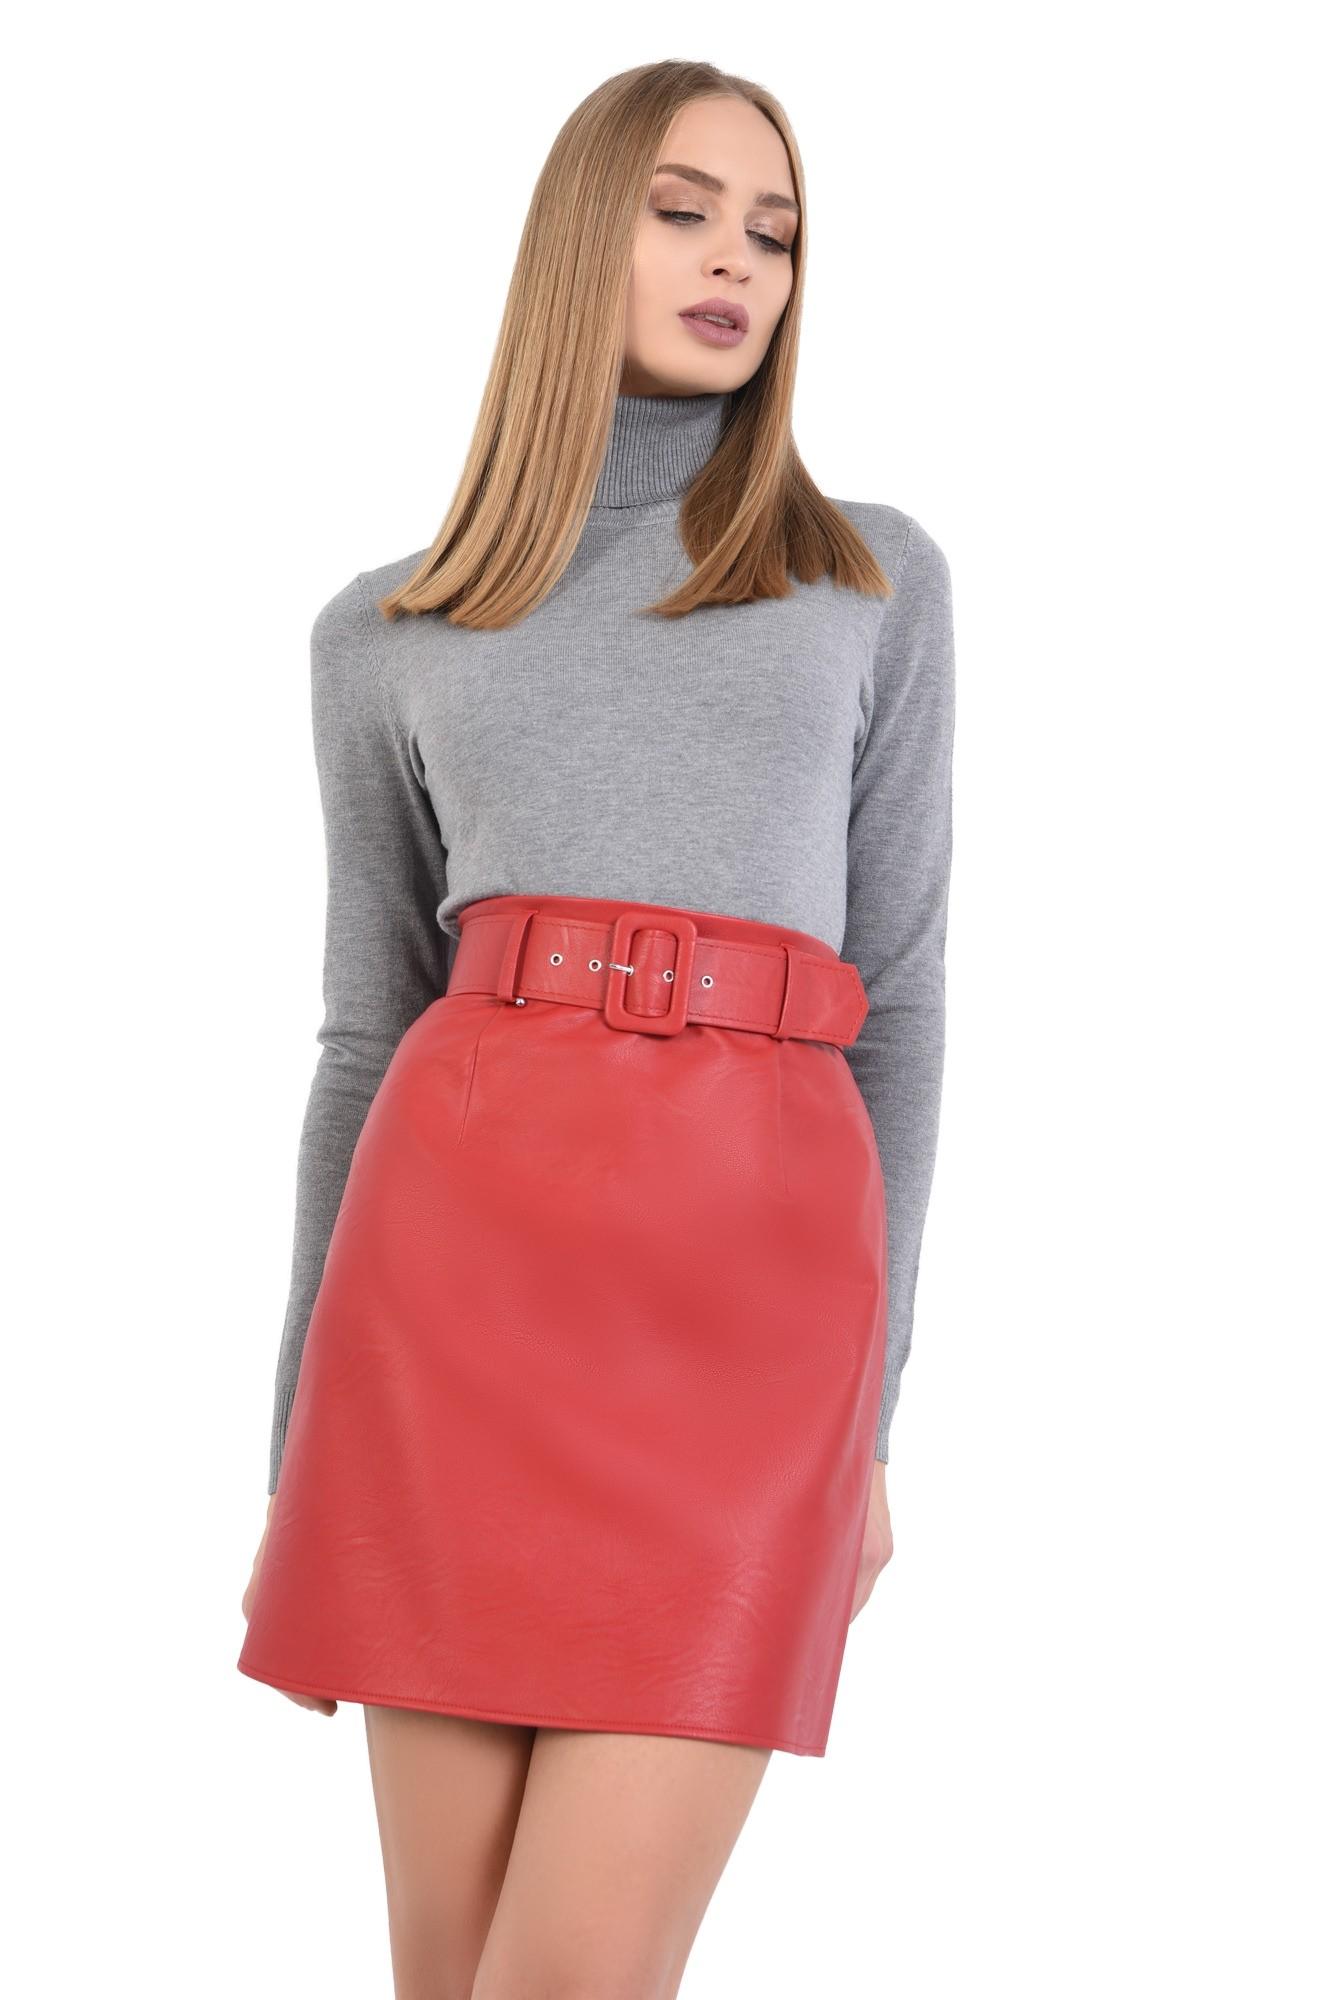 3 - pulover tip maleta, gri, borduri reiate, guler inalt, bluza tricotata